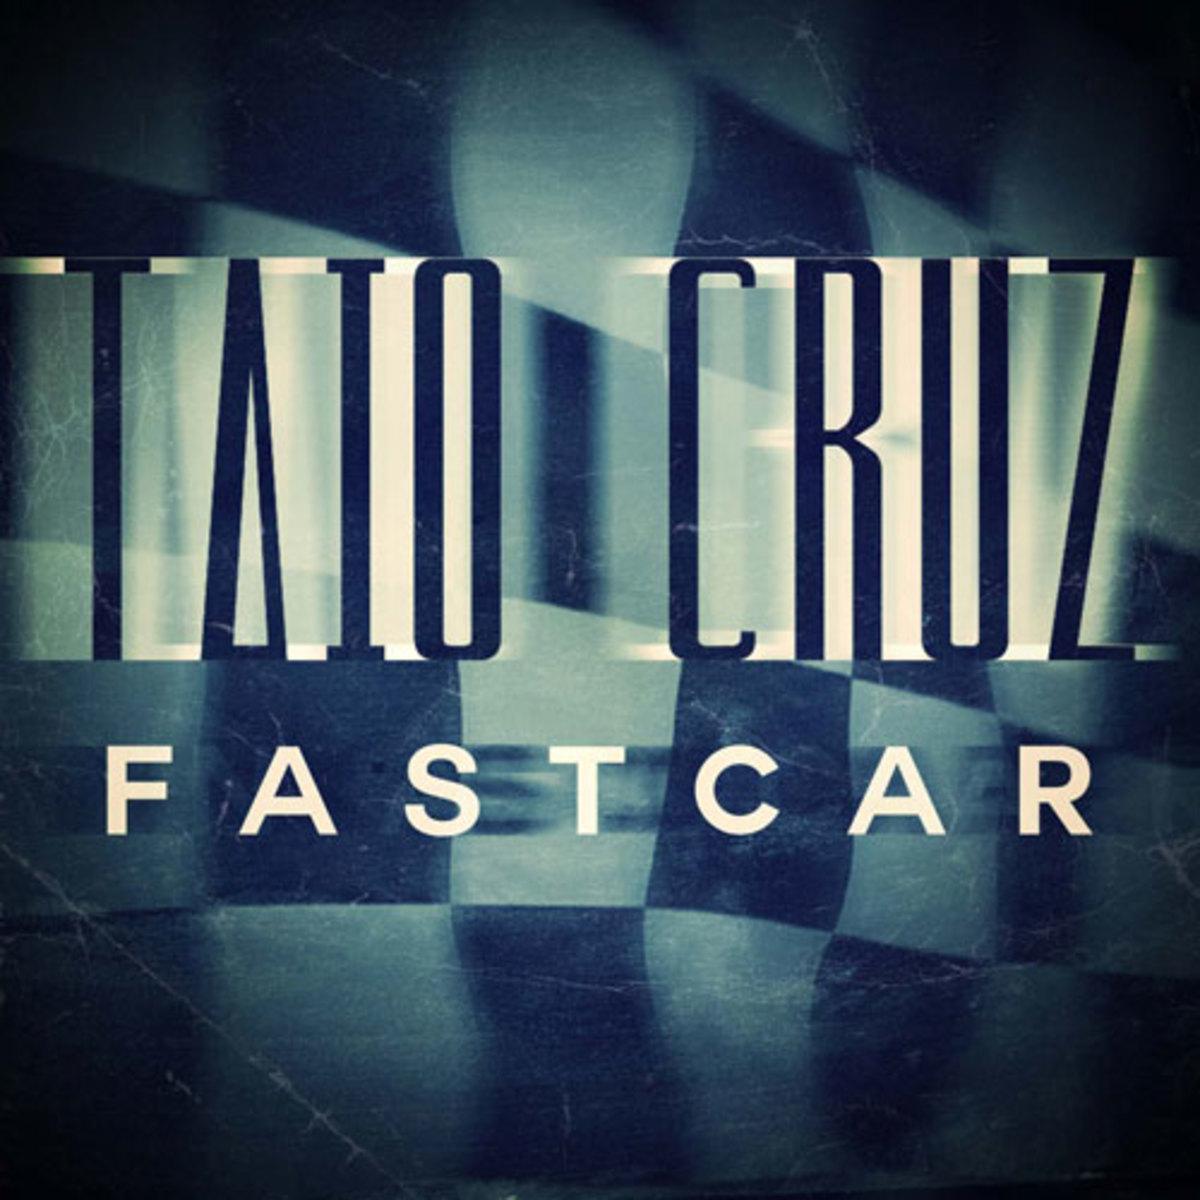 taiocruz-fastcar.jpg